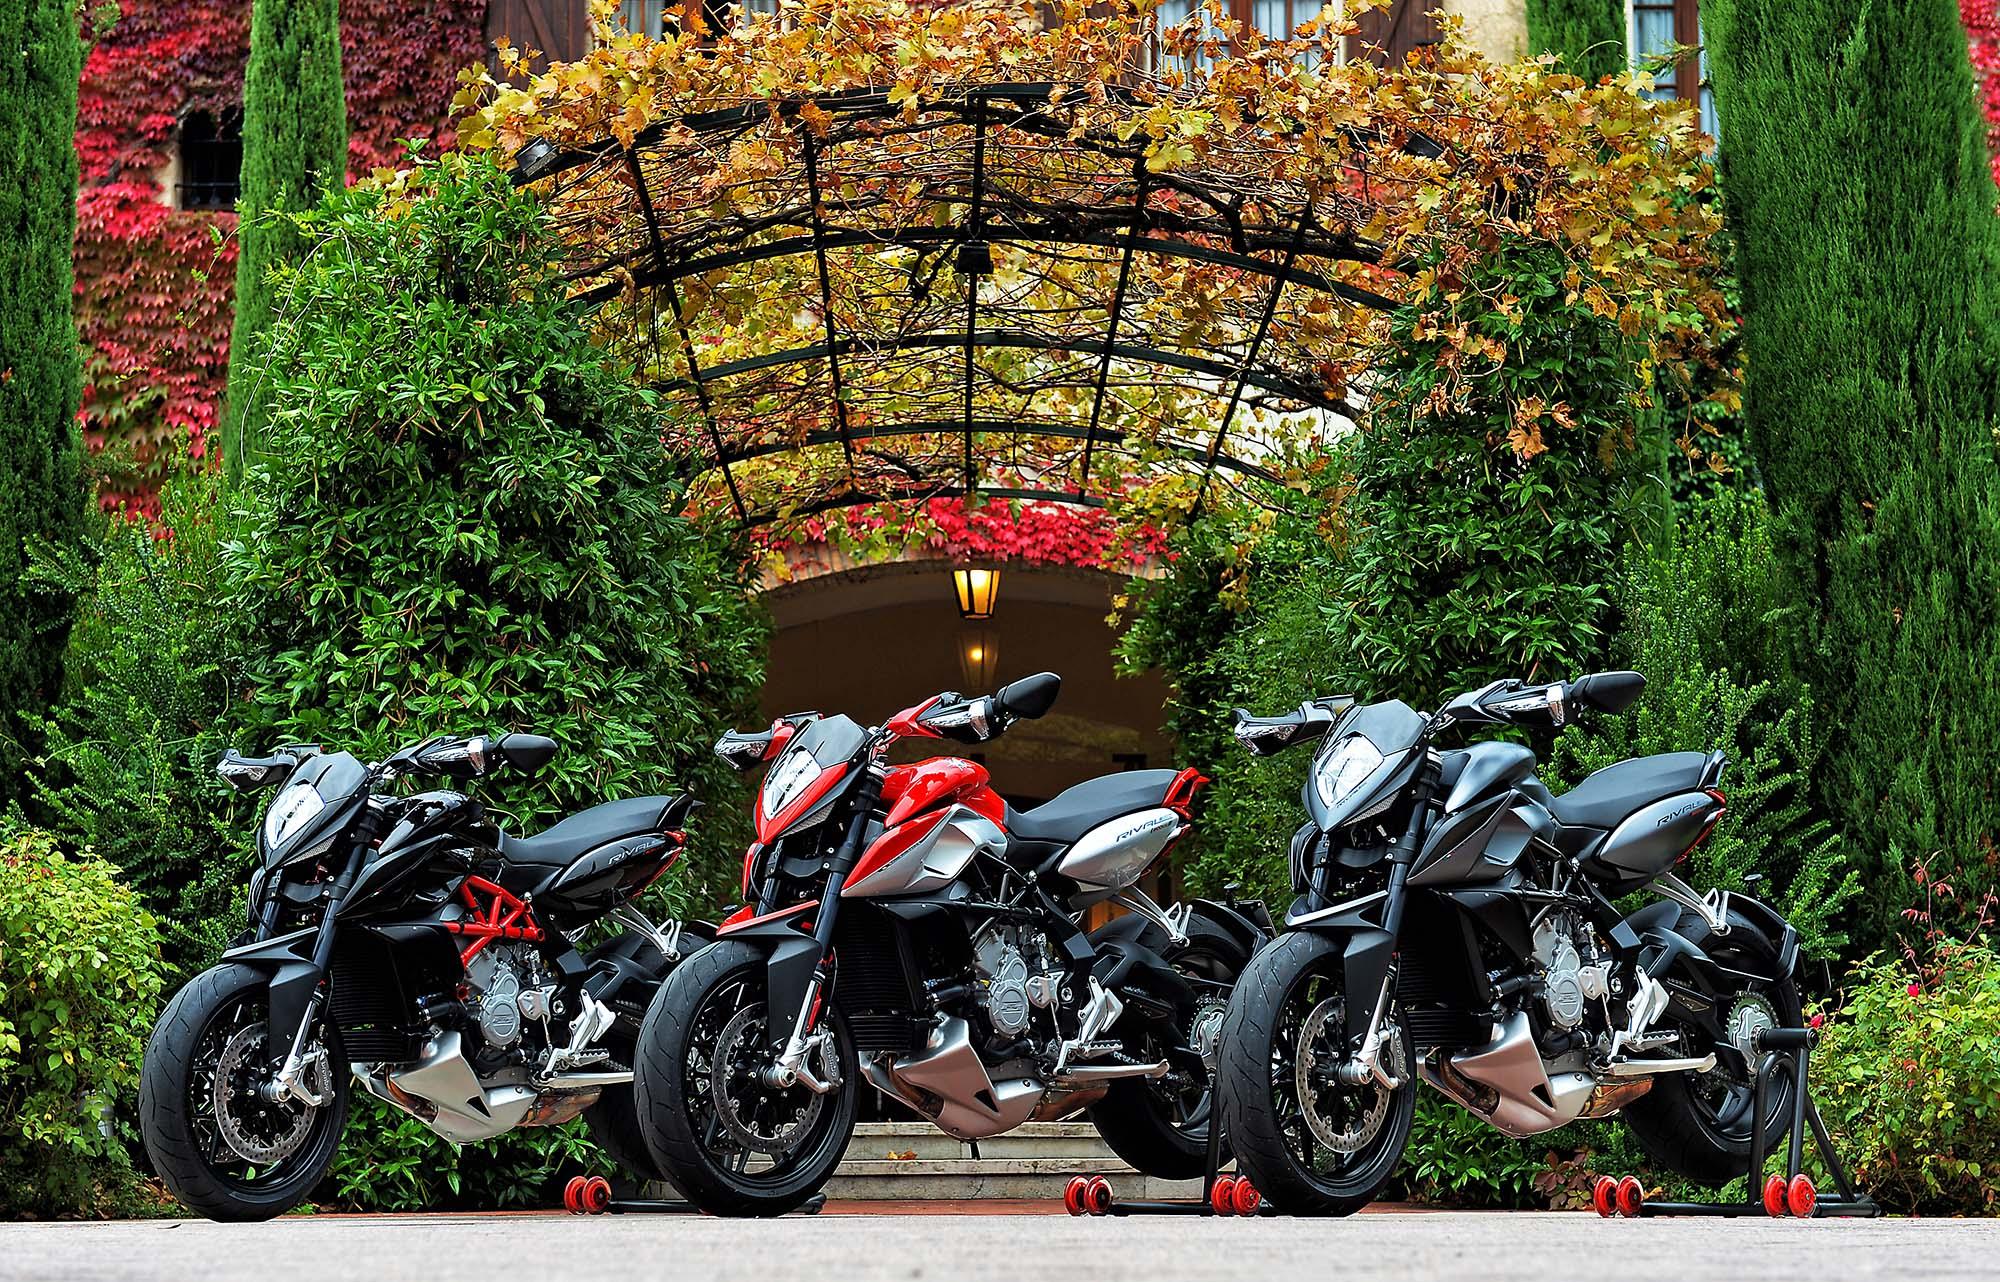 The 2014 mv agusta rivale 800 is not everyone s friend the bike